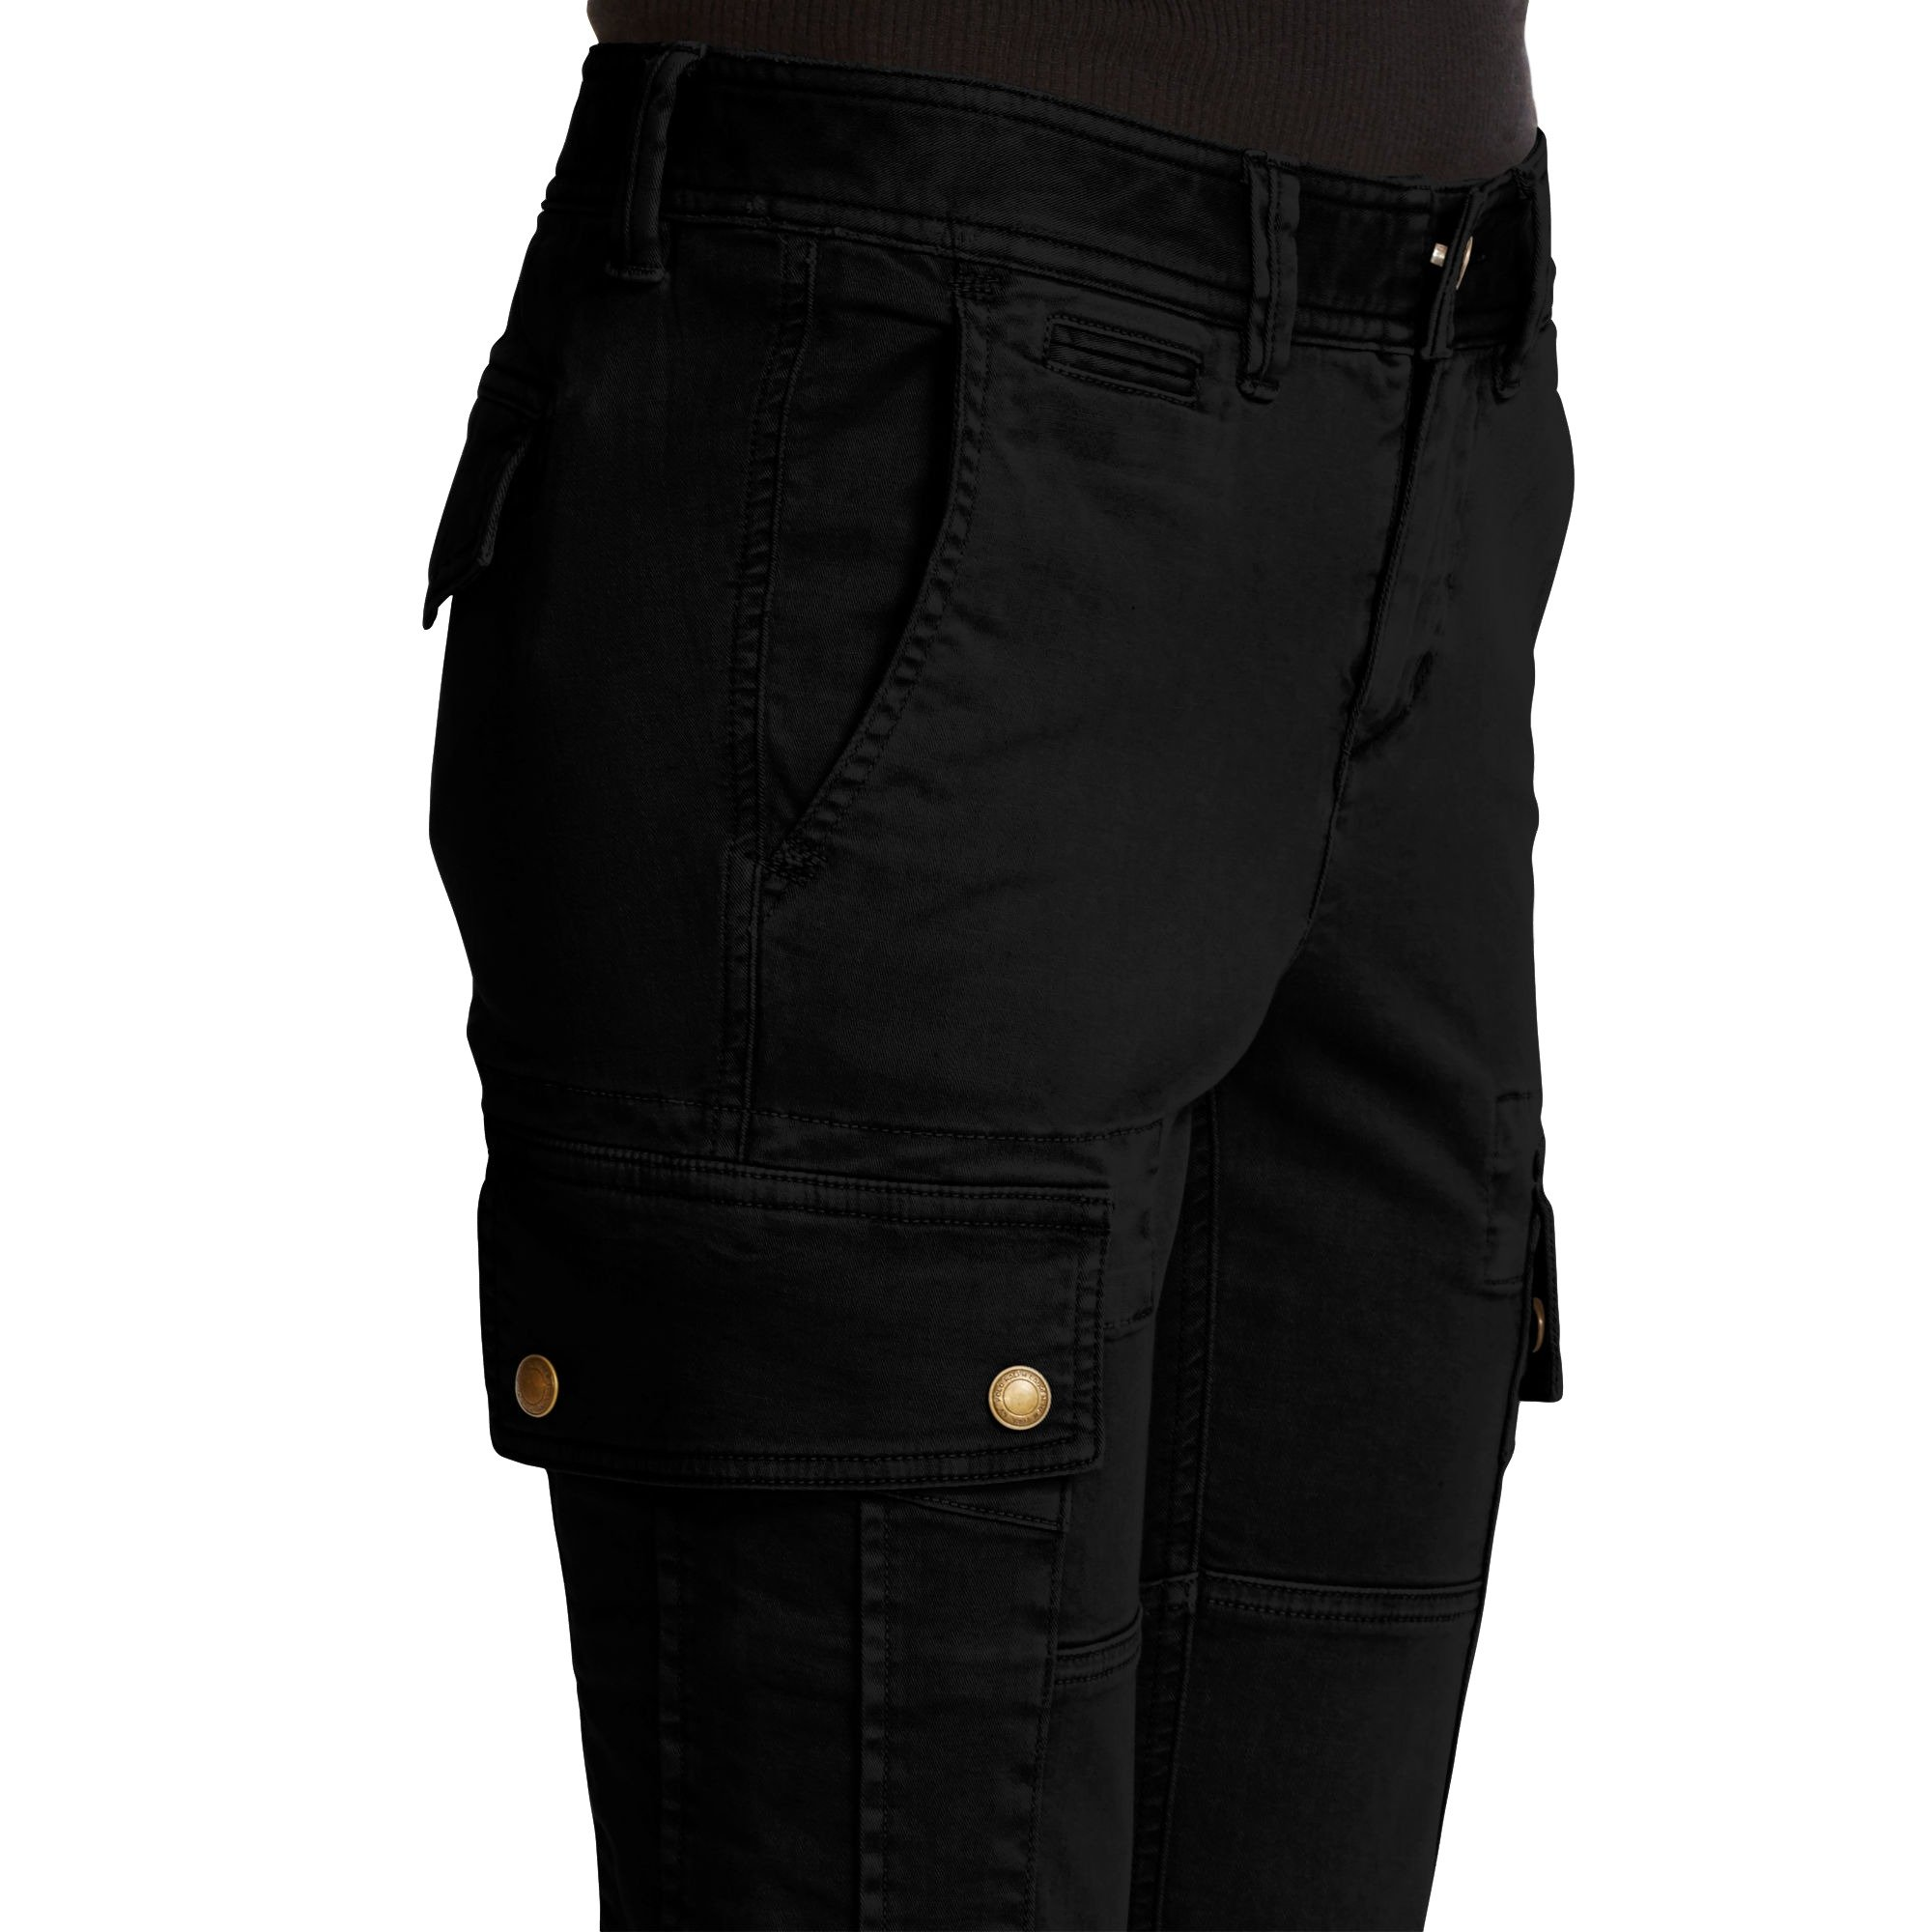 Polo Ralph Lauren Womens Twill Flat Front Cargo Pants Black 10 by Polo Ralph Lauren (Image #1)